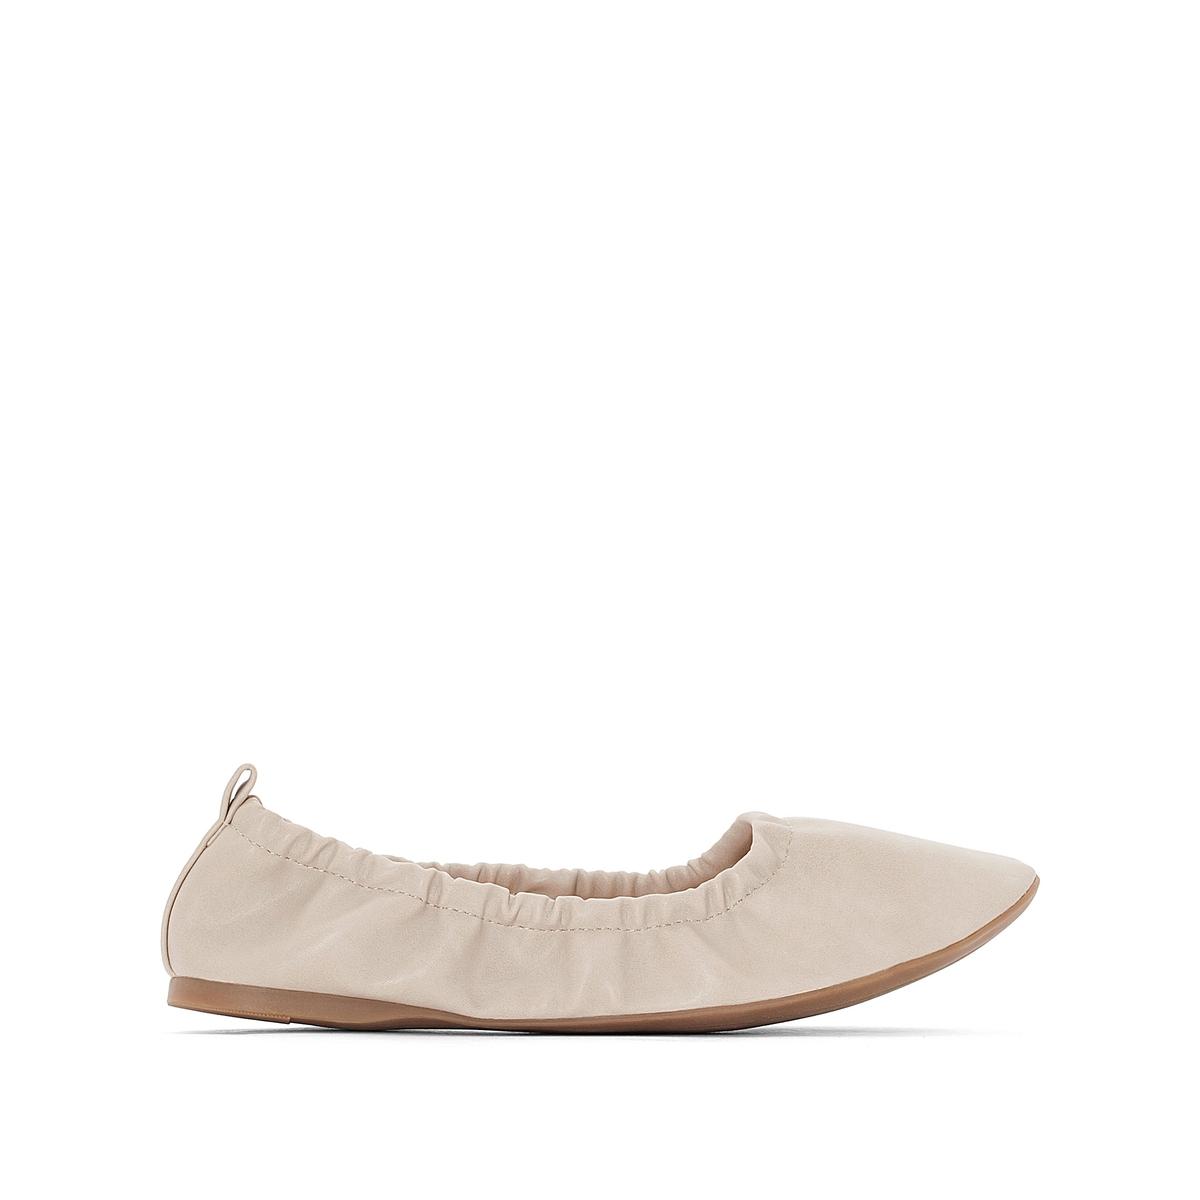 Soepele ballerina's